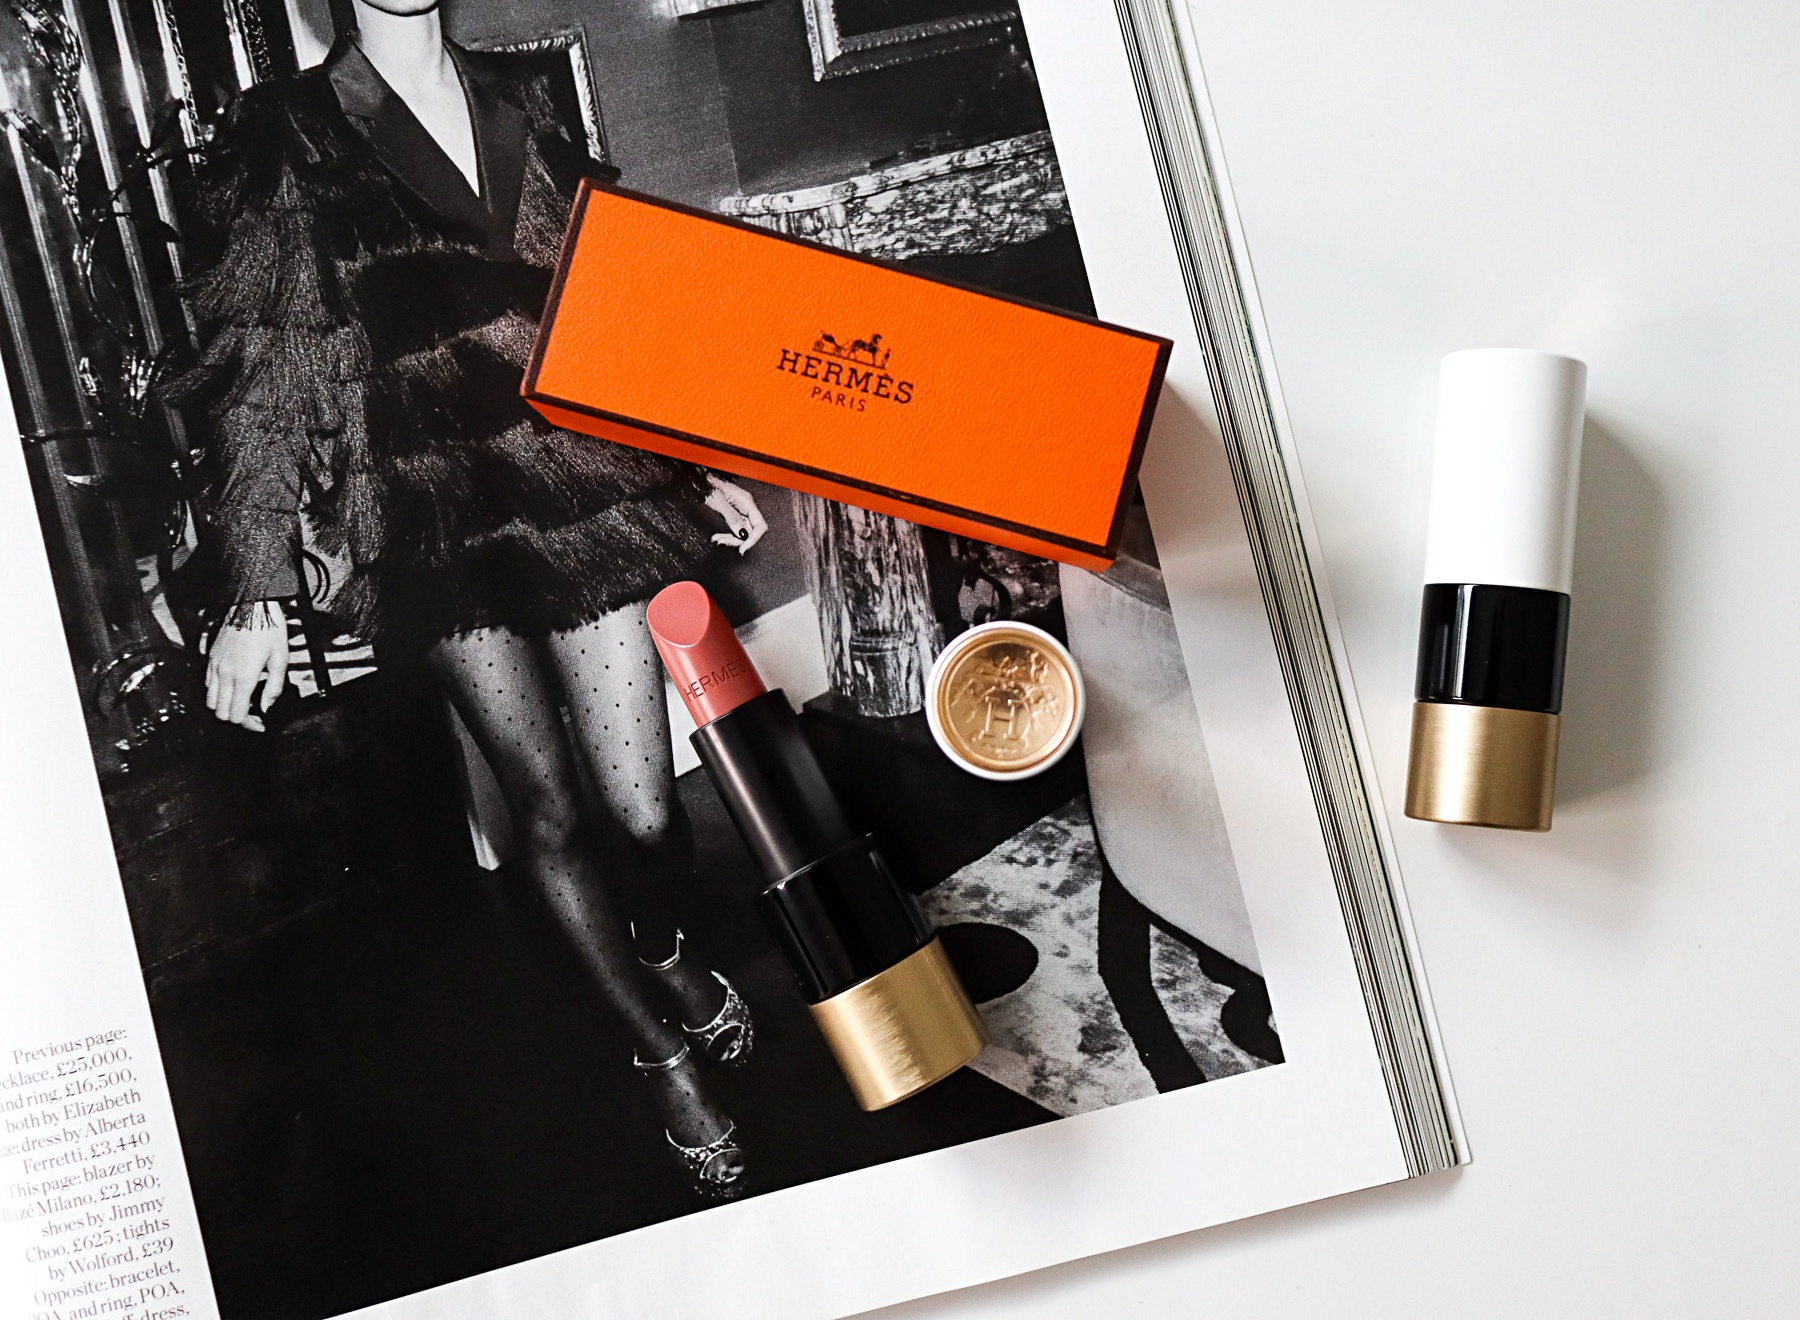 Hermes Rouge Lipstick Beige Kalahari 13 Review | The LDN Diaries